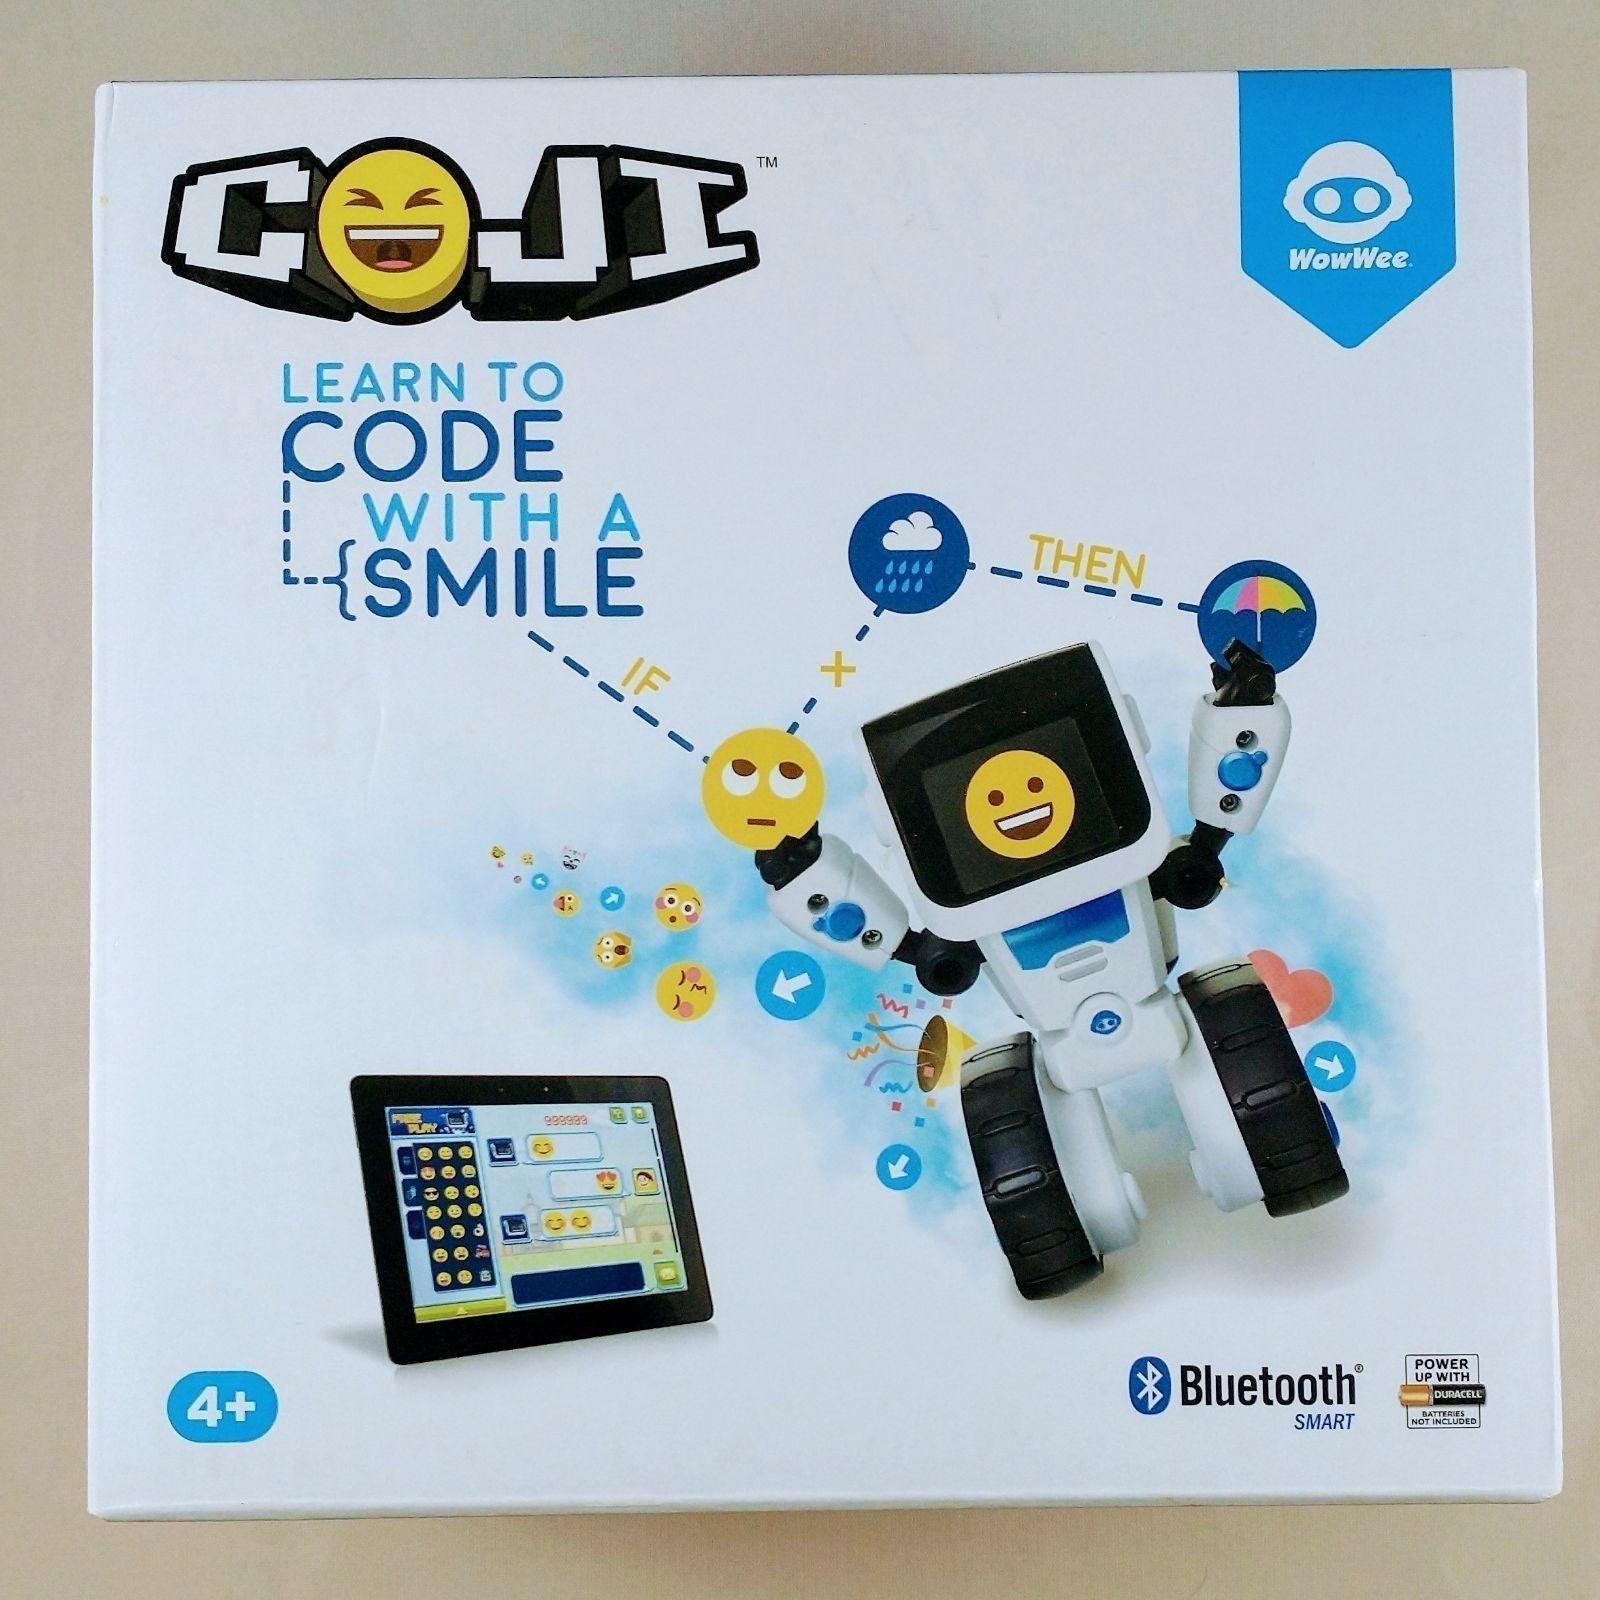 COJI Coding Robot Learn to Code